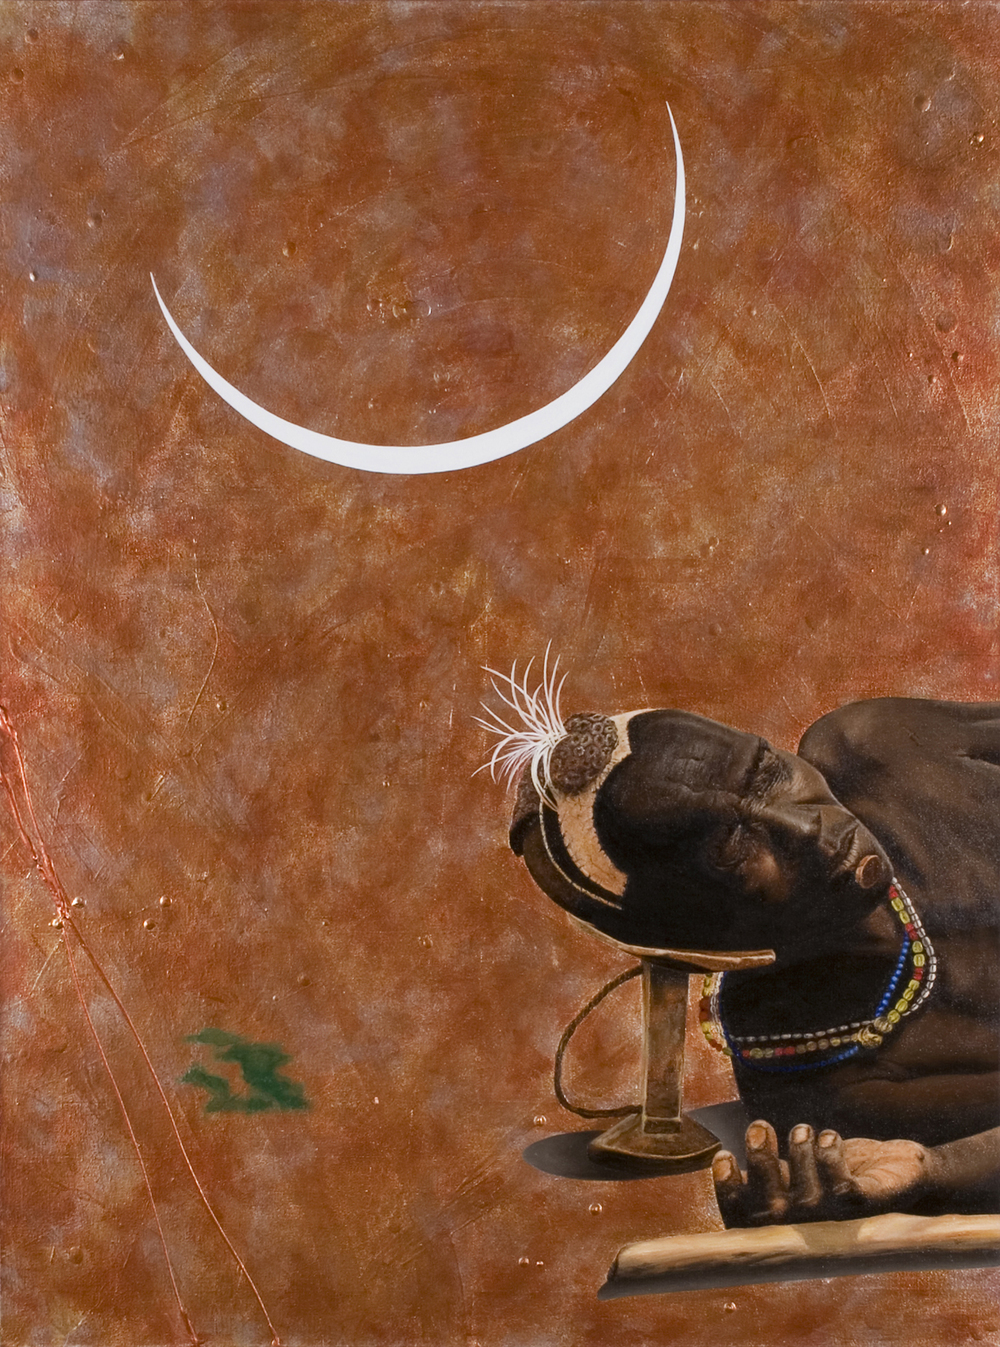 Sonhador de Turkana (Turkan Dreamer)